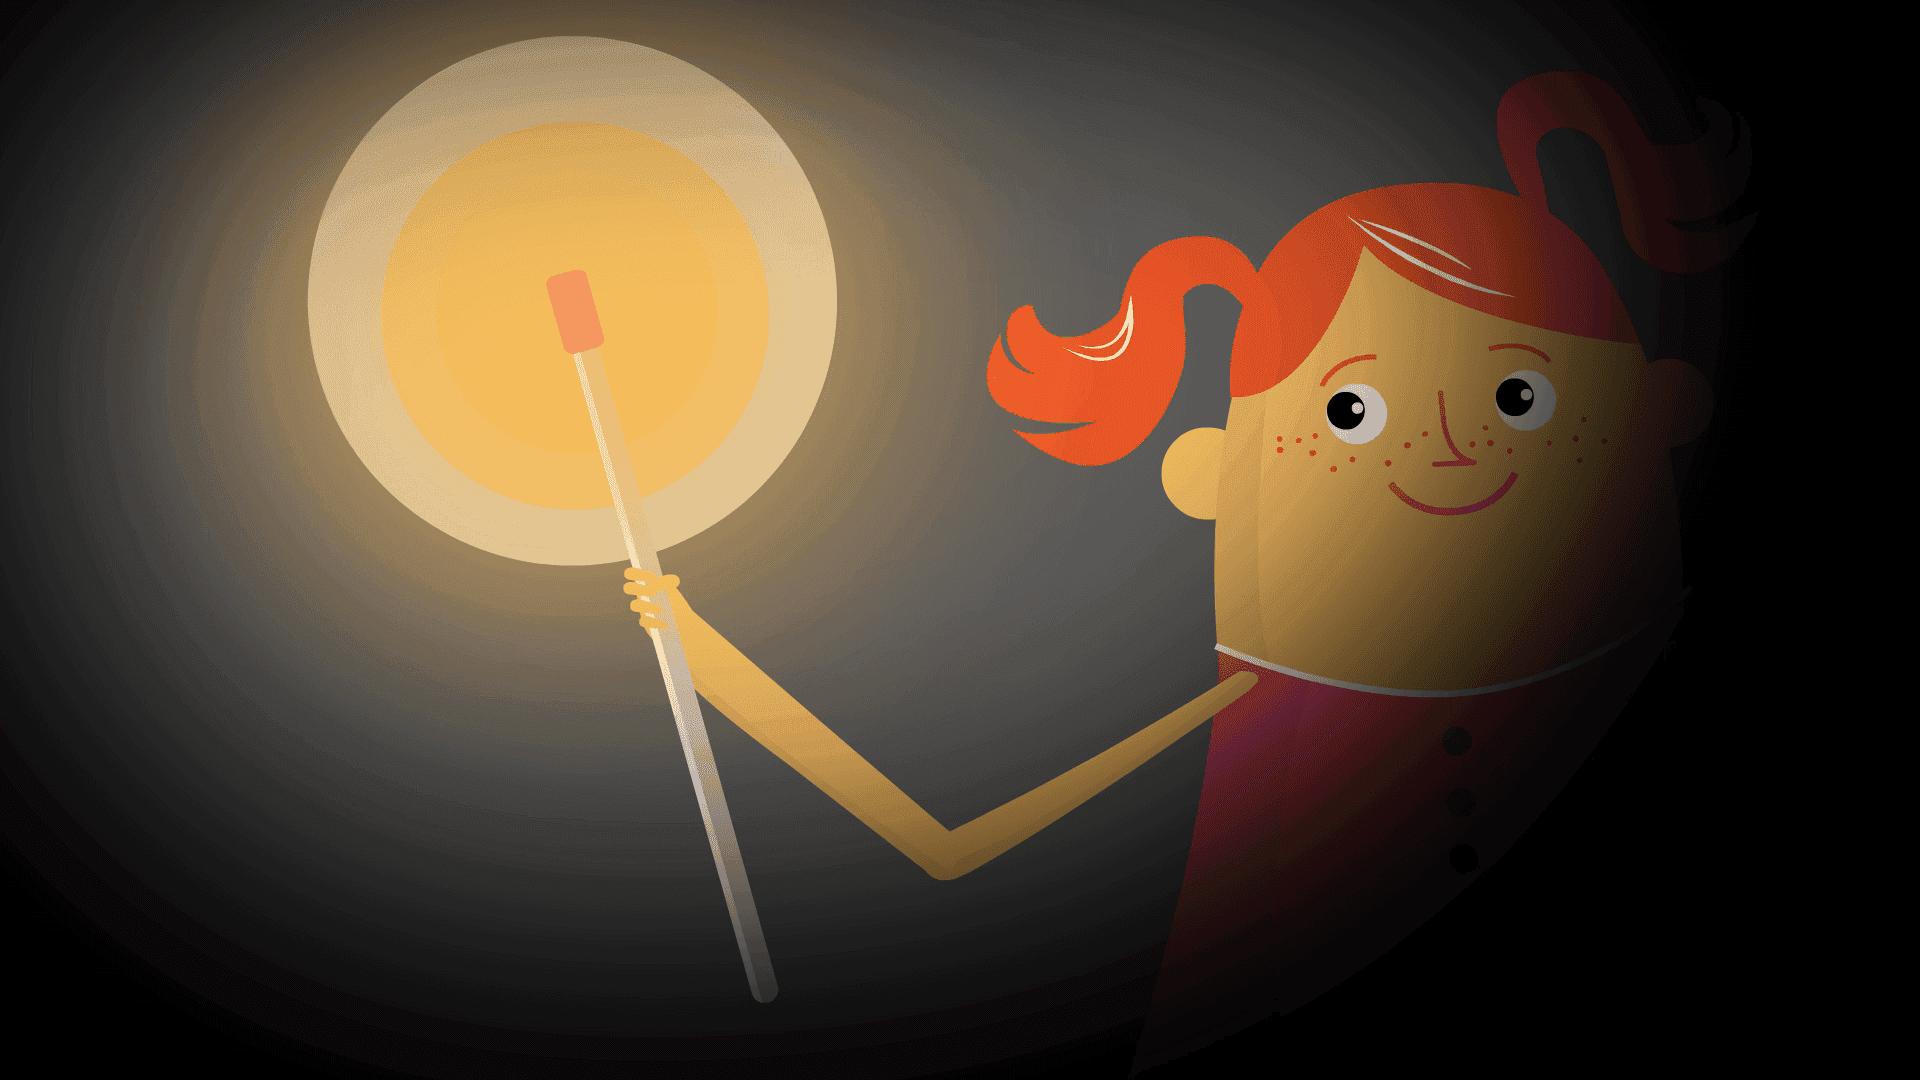 Girl - Character Animation